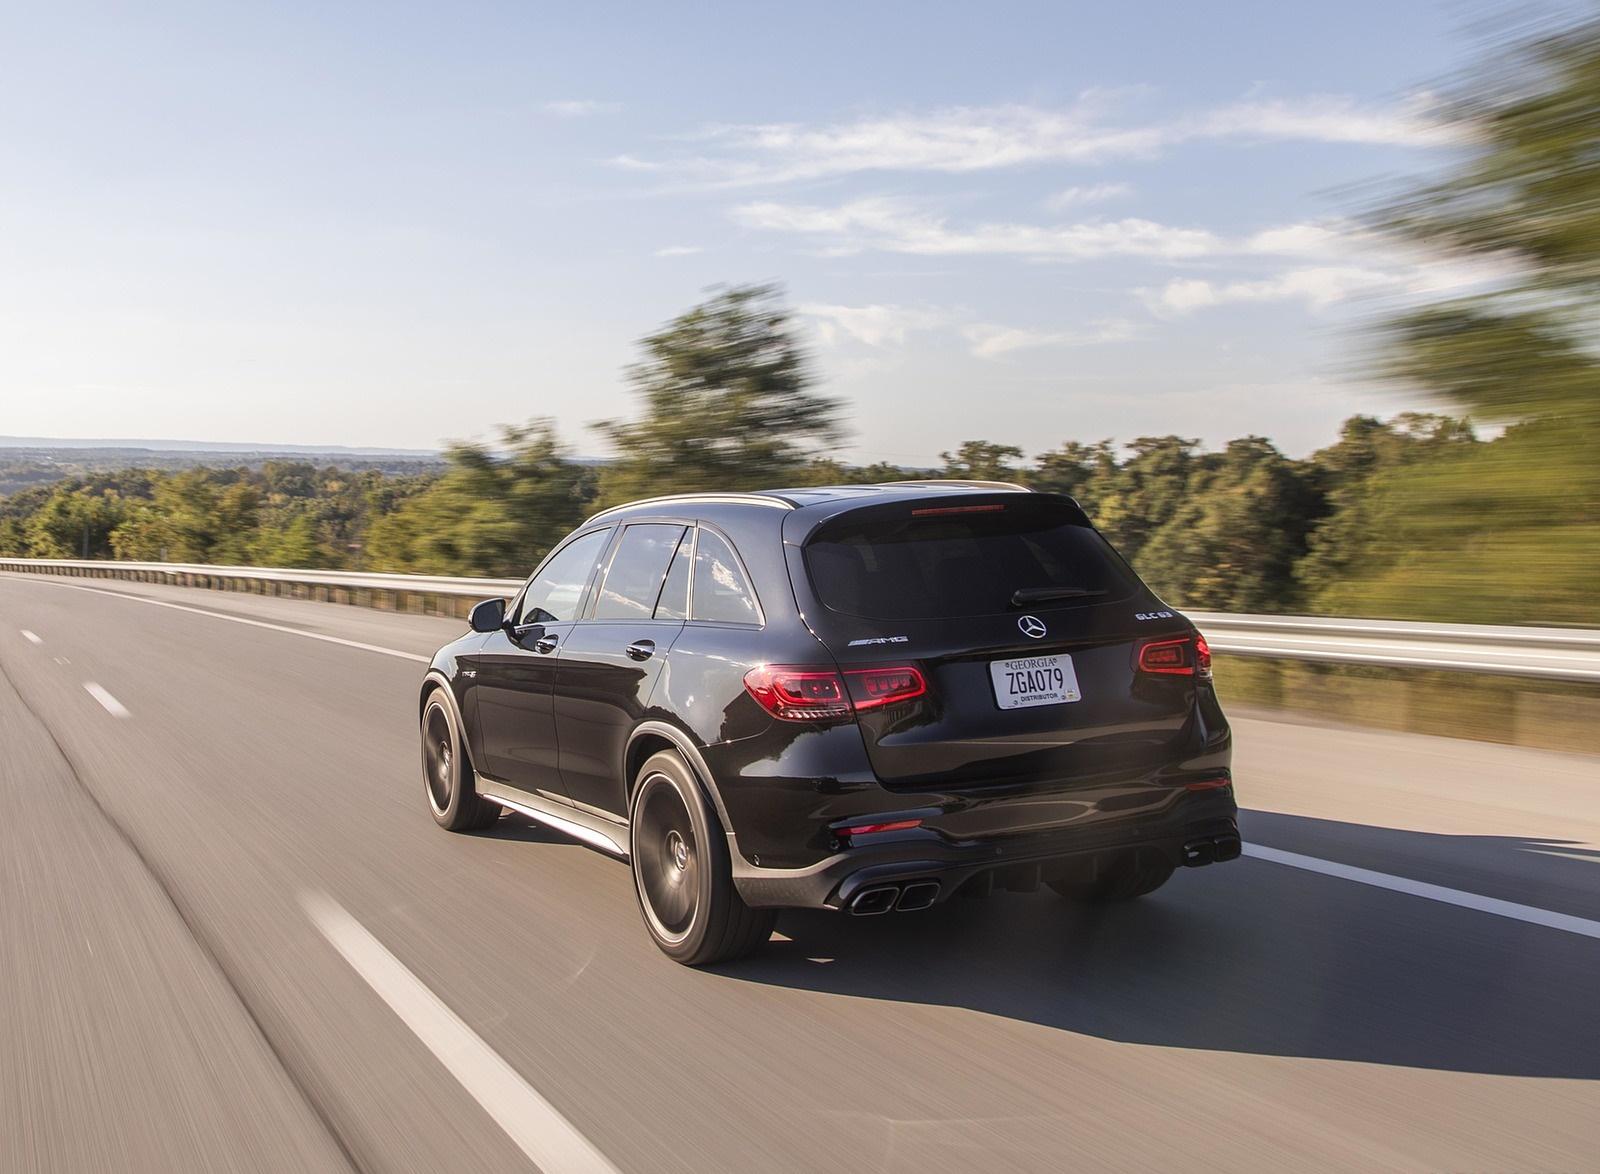 2020 Mercedes-AMG GLC 63 (US-Spec) Rear Three-Quarter Wallpapers (7)